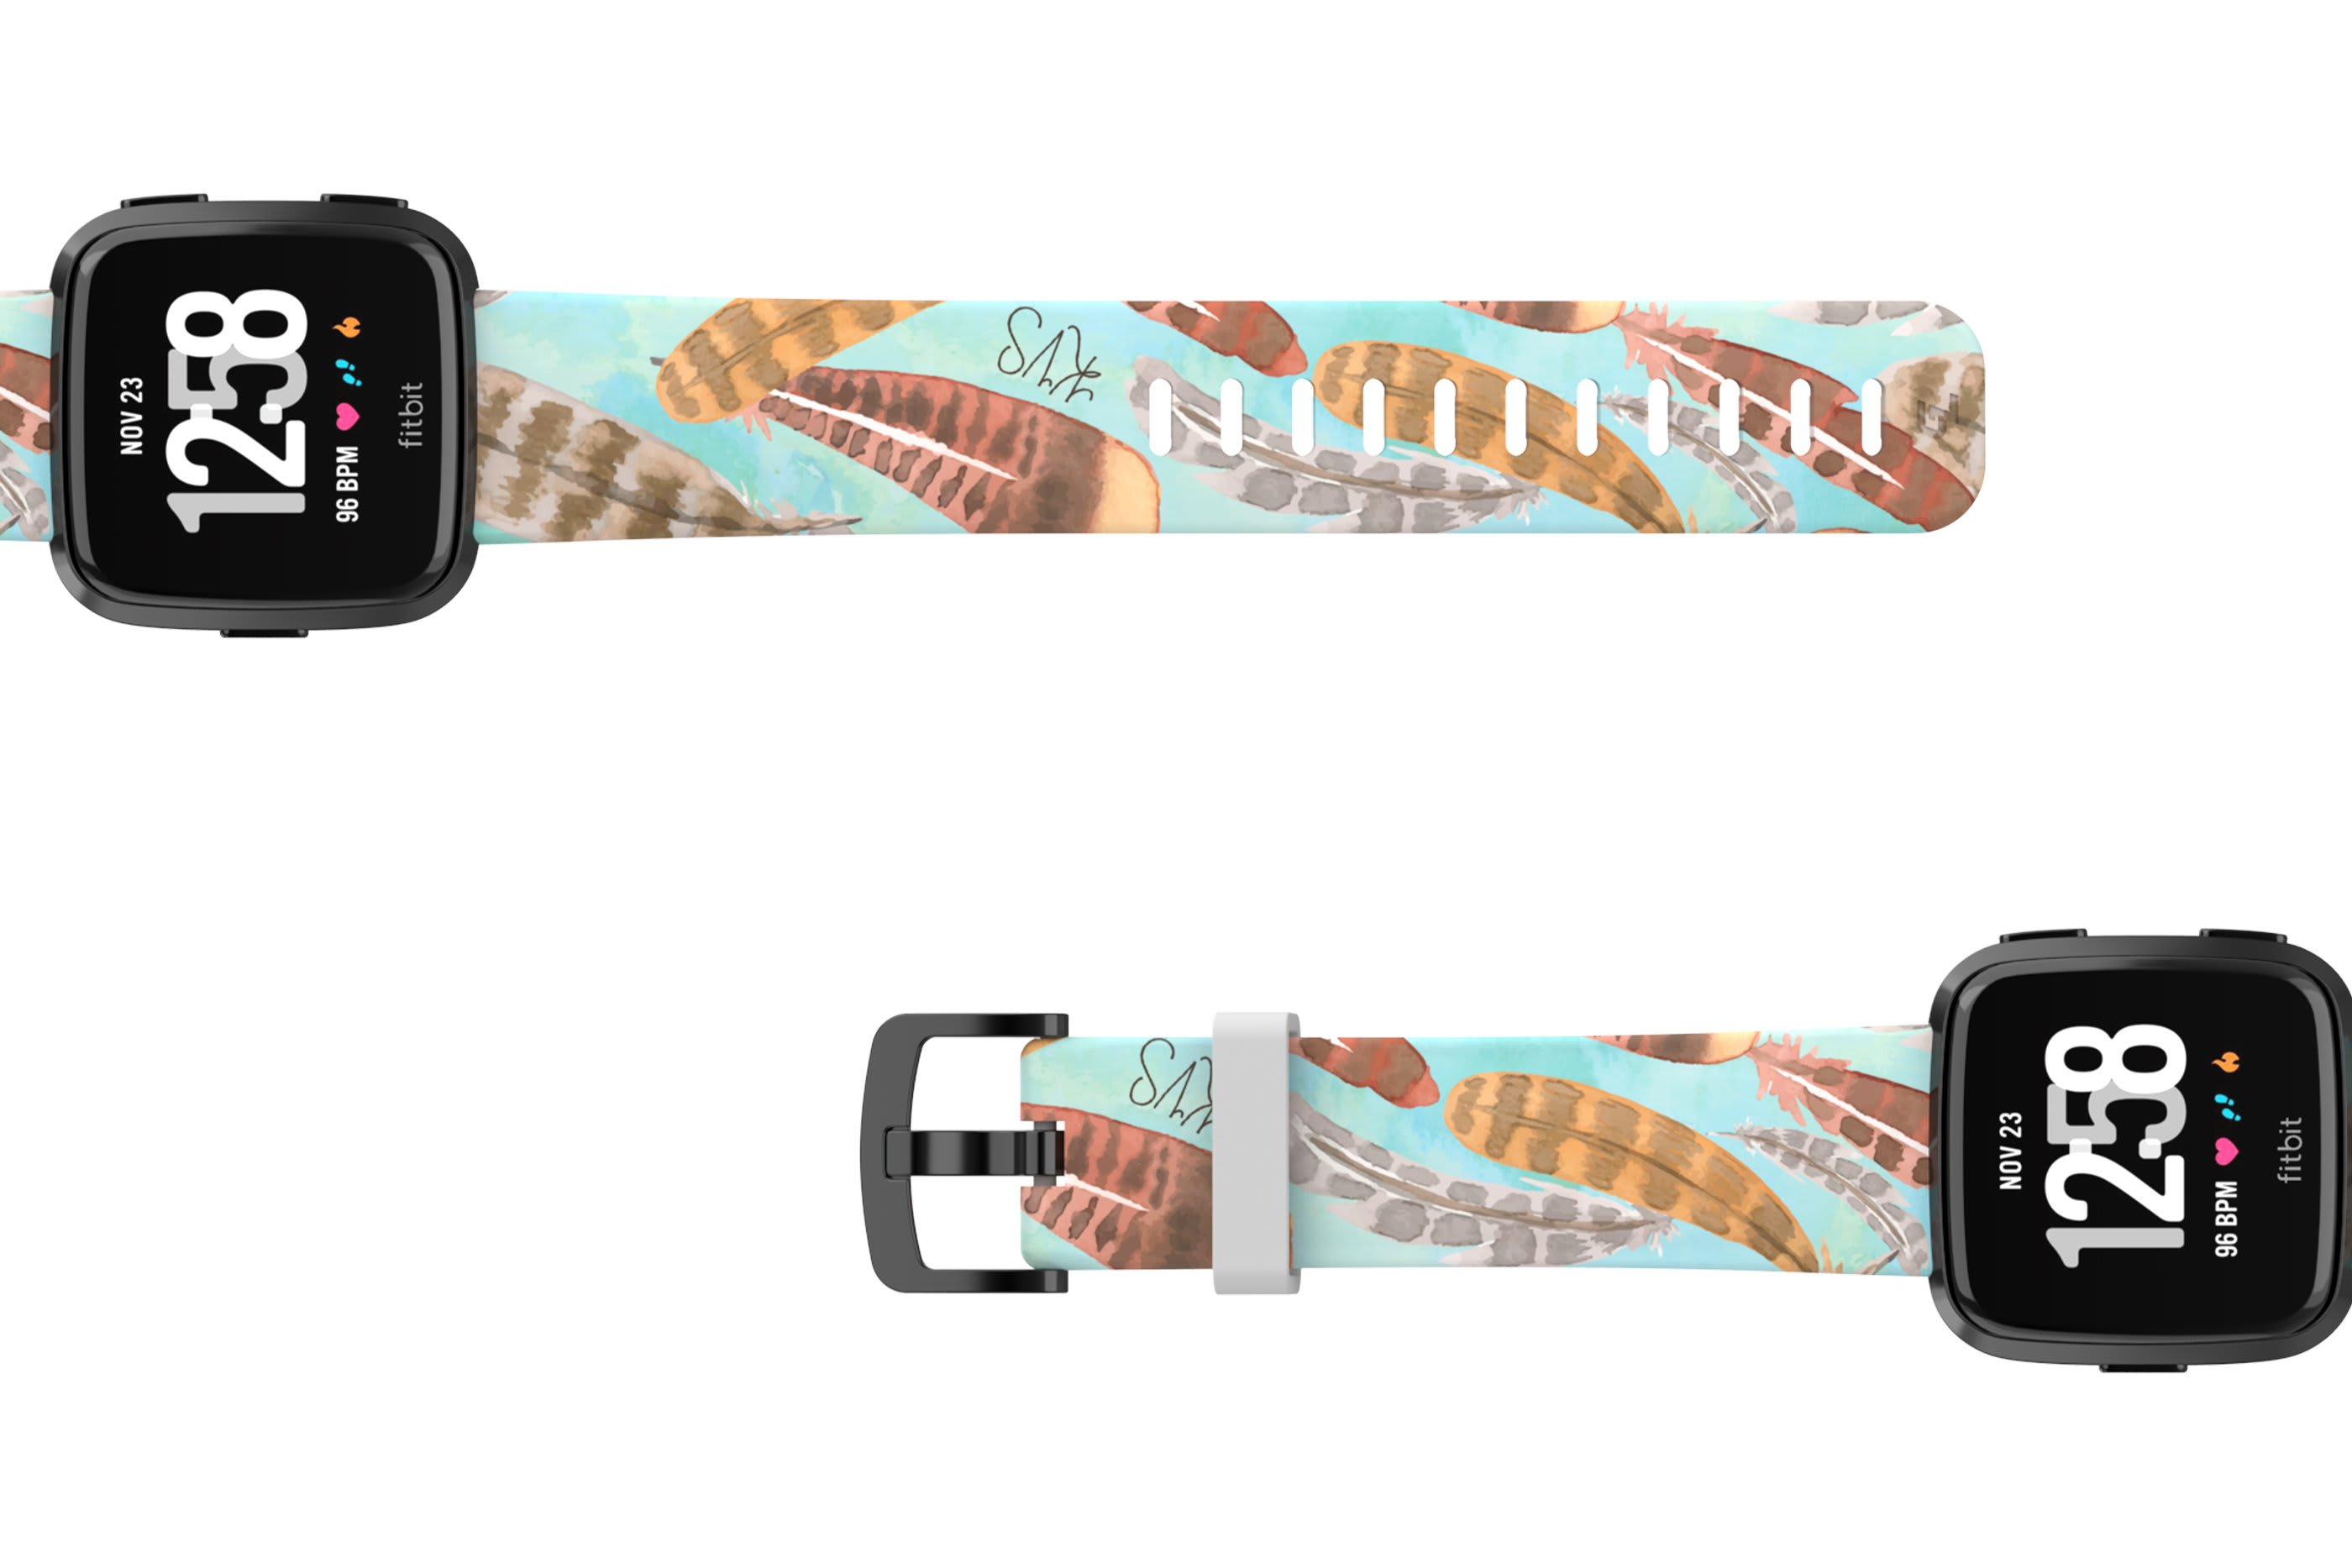 Brave - Katie Van Slyke Fitbit Versa watch band with gray hardware viewed top down